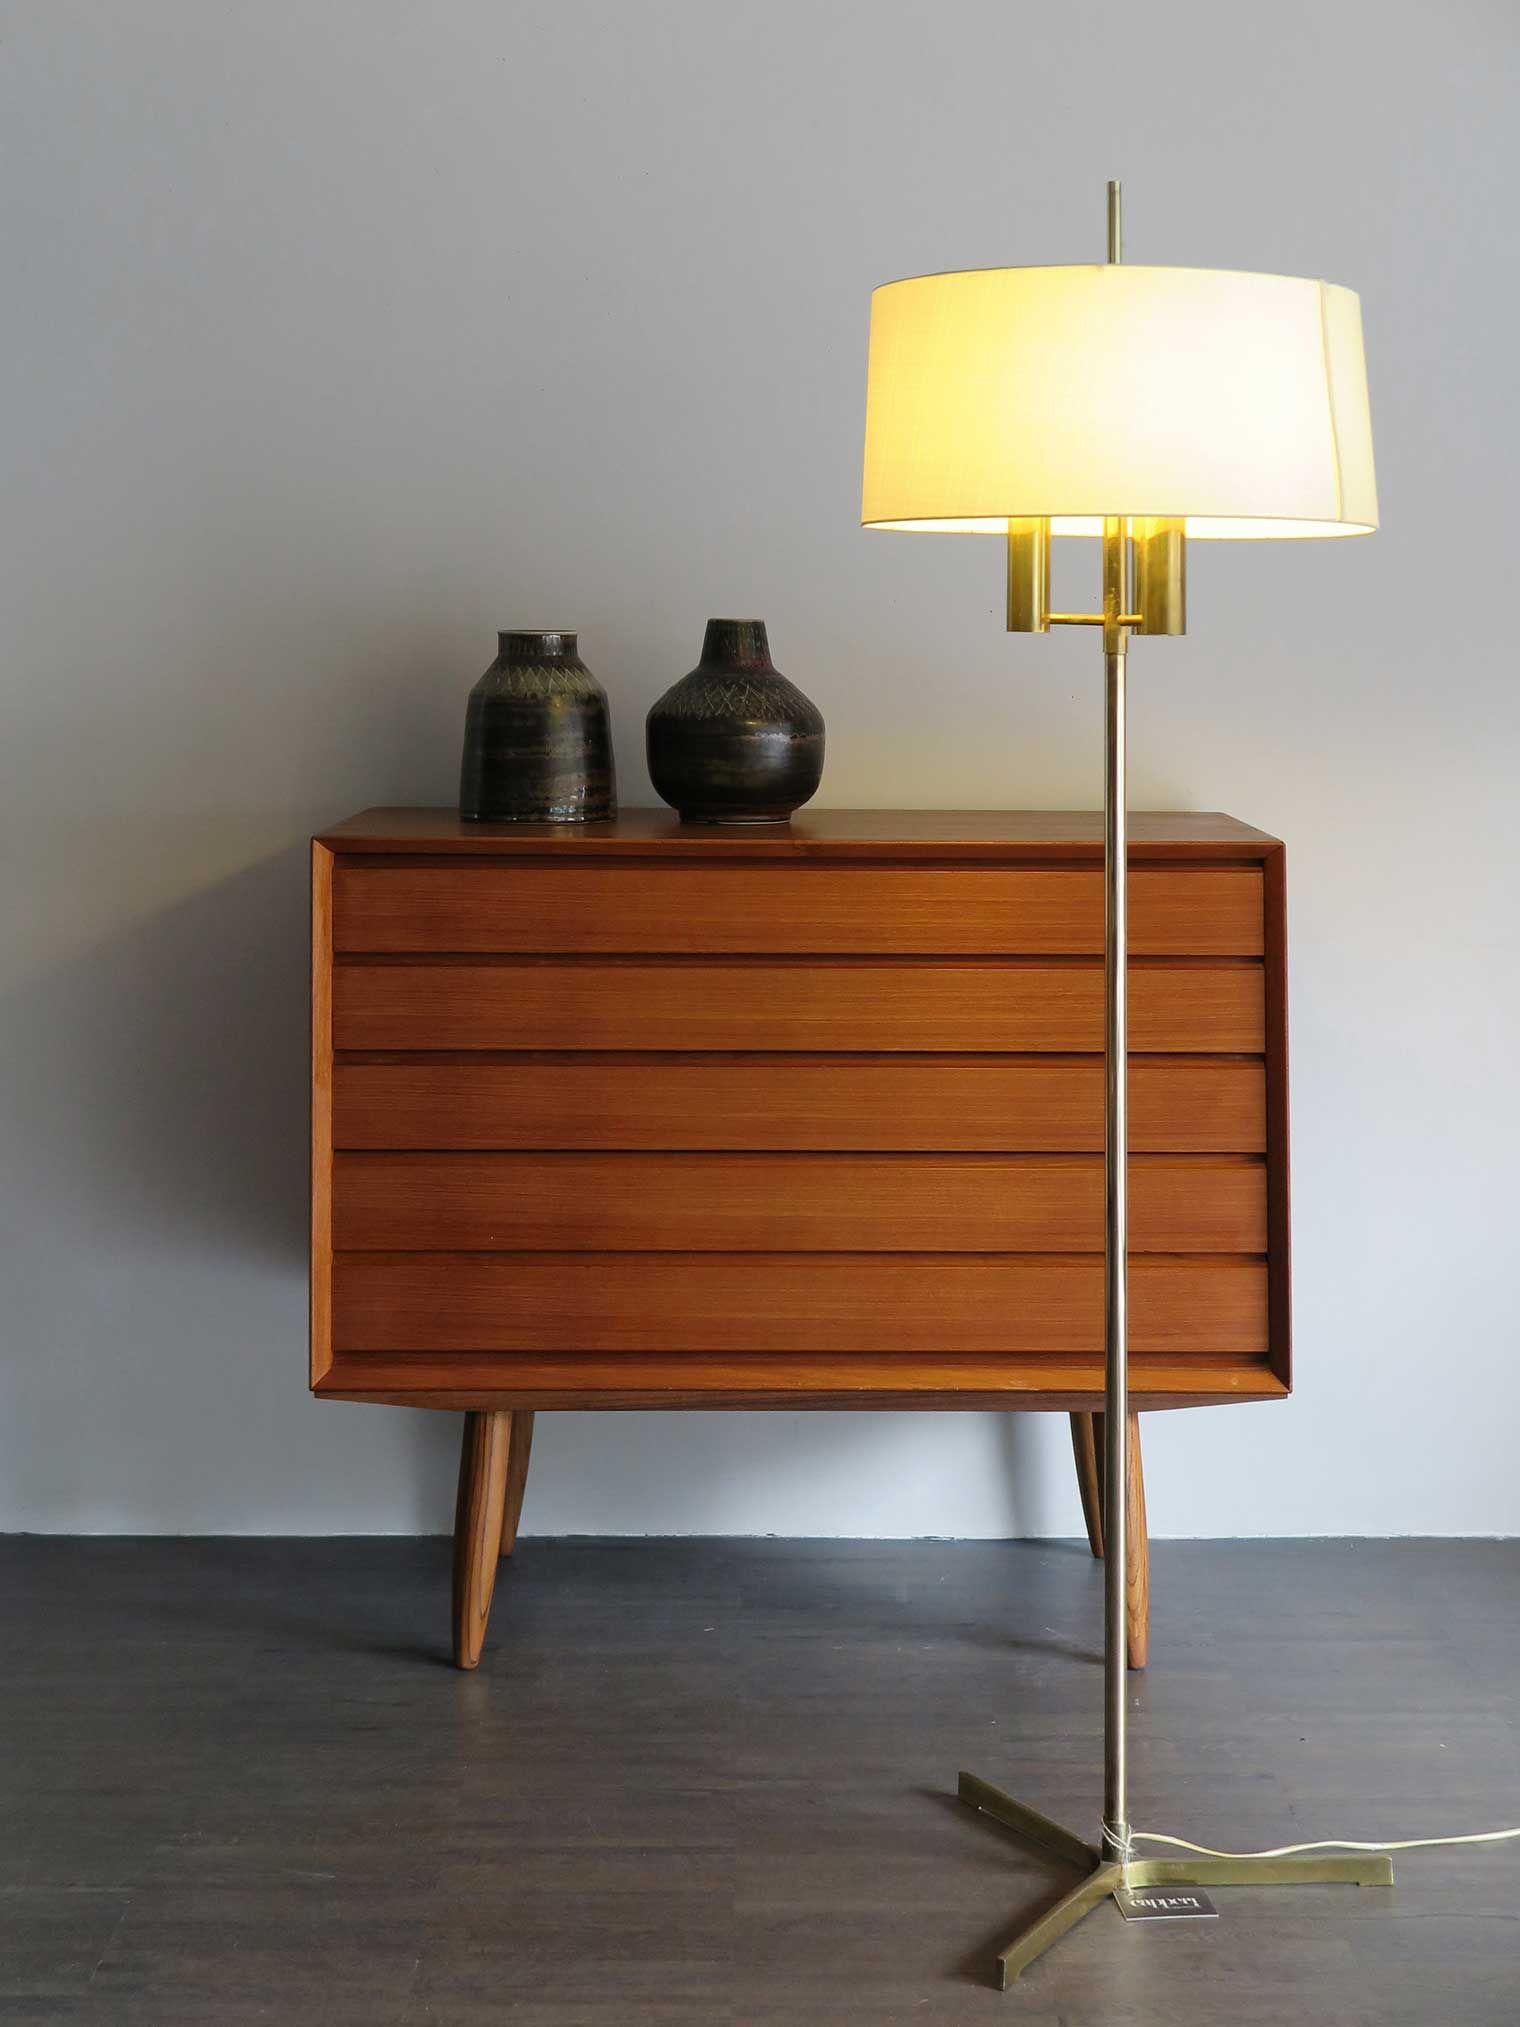 Design Scandinavo Anni 50 cassettiera danese in teak, anni 60 - lampada danese